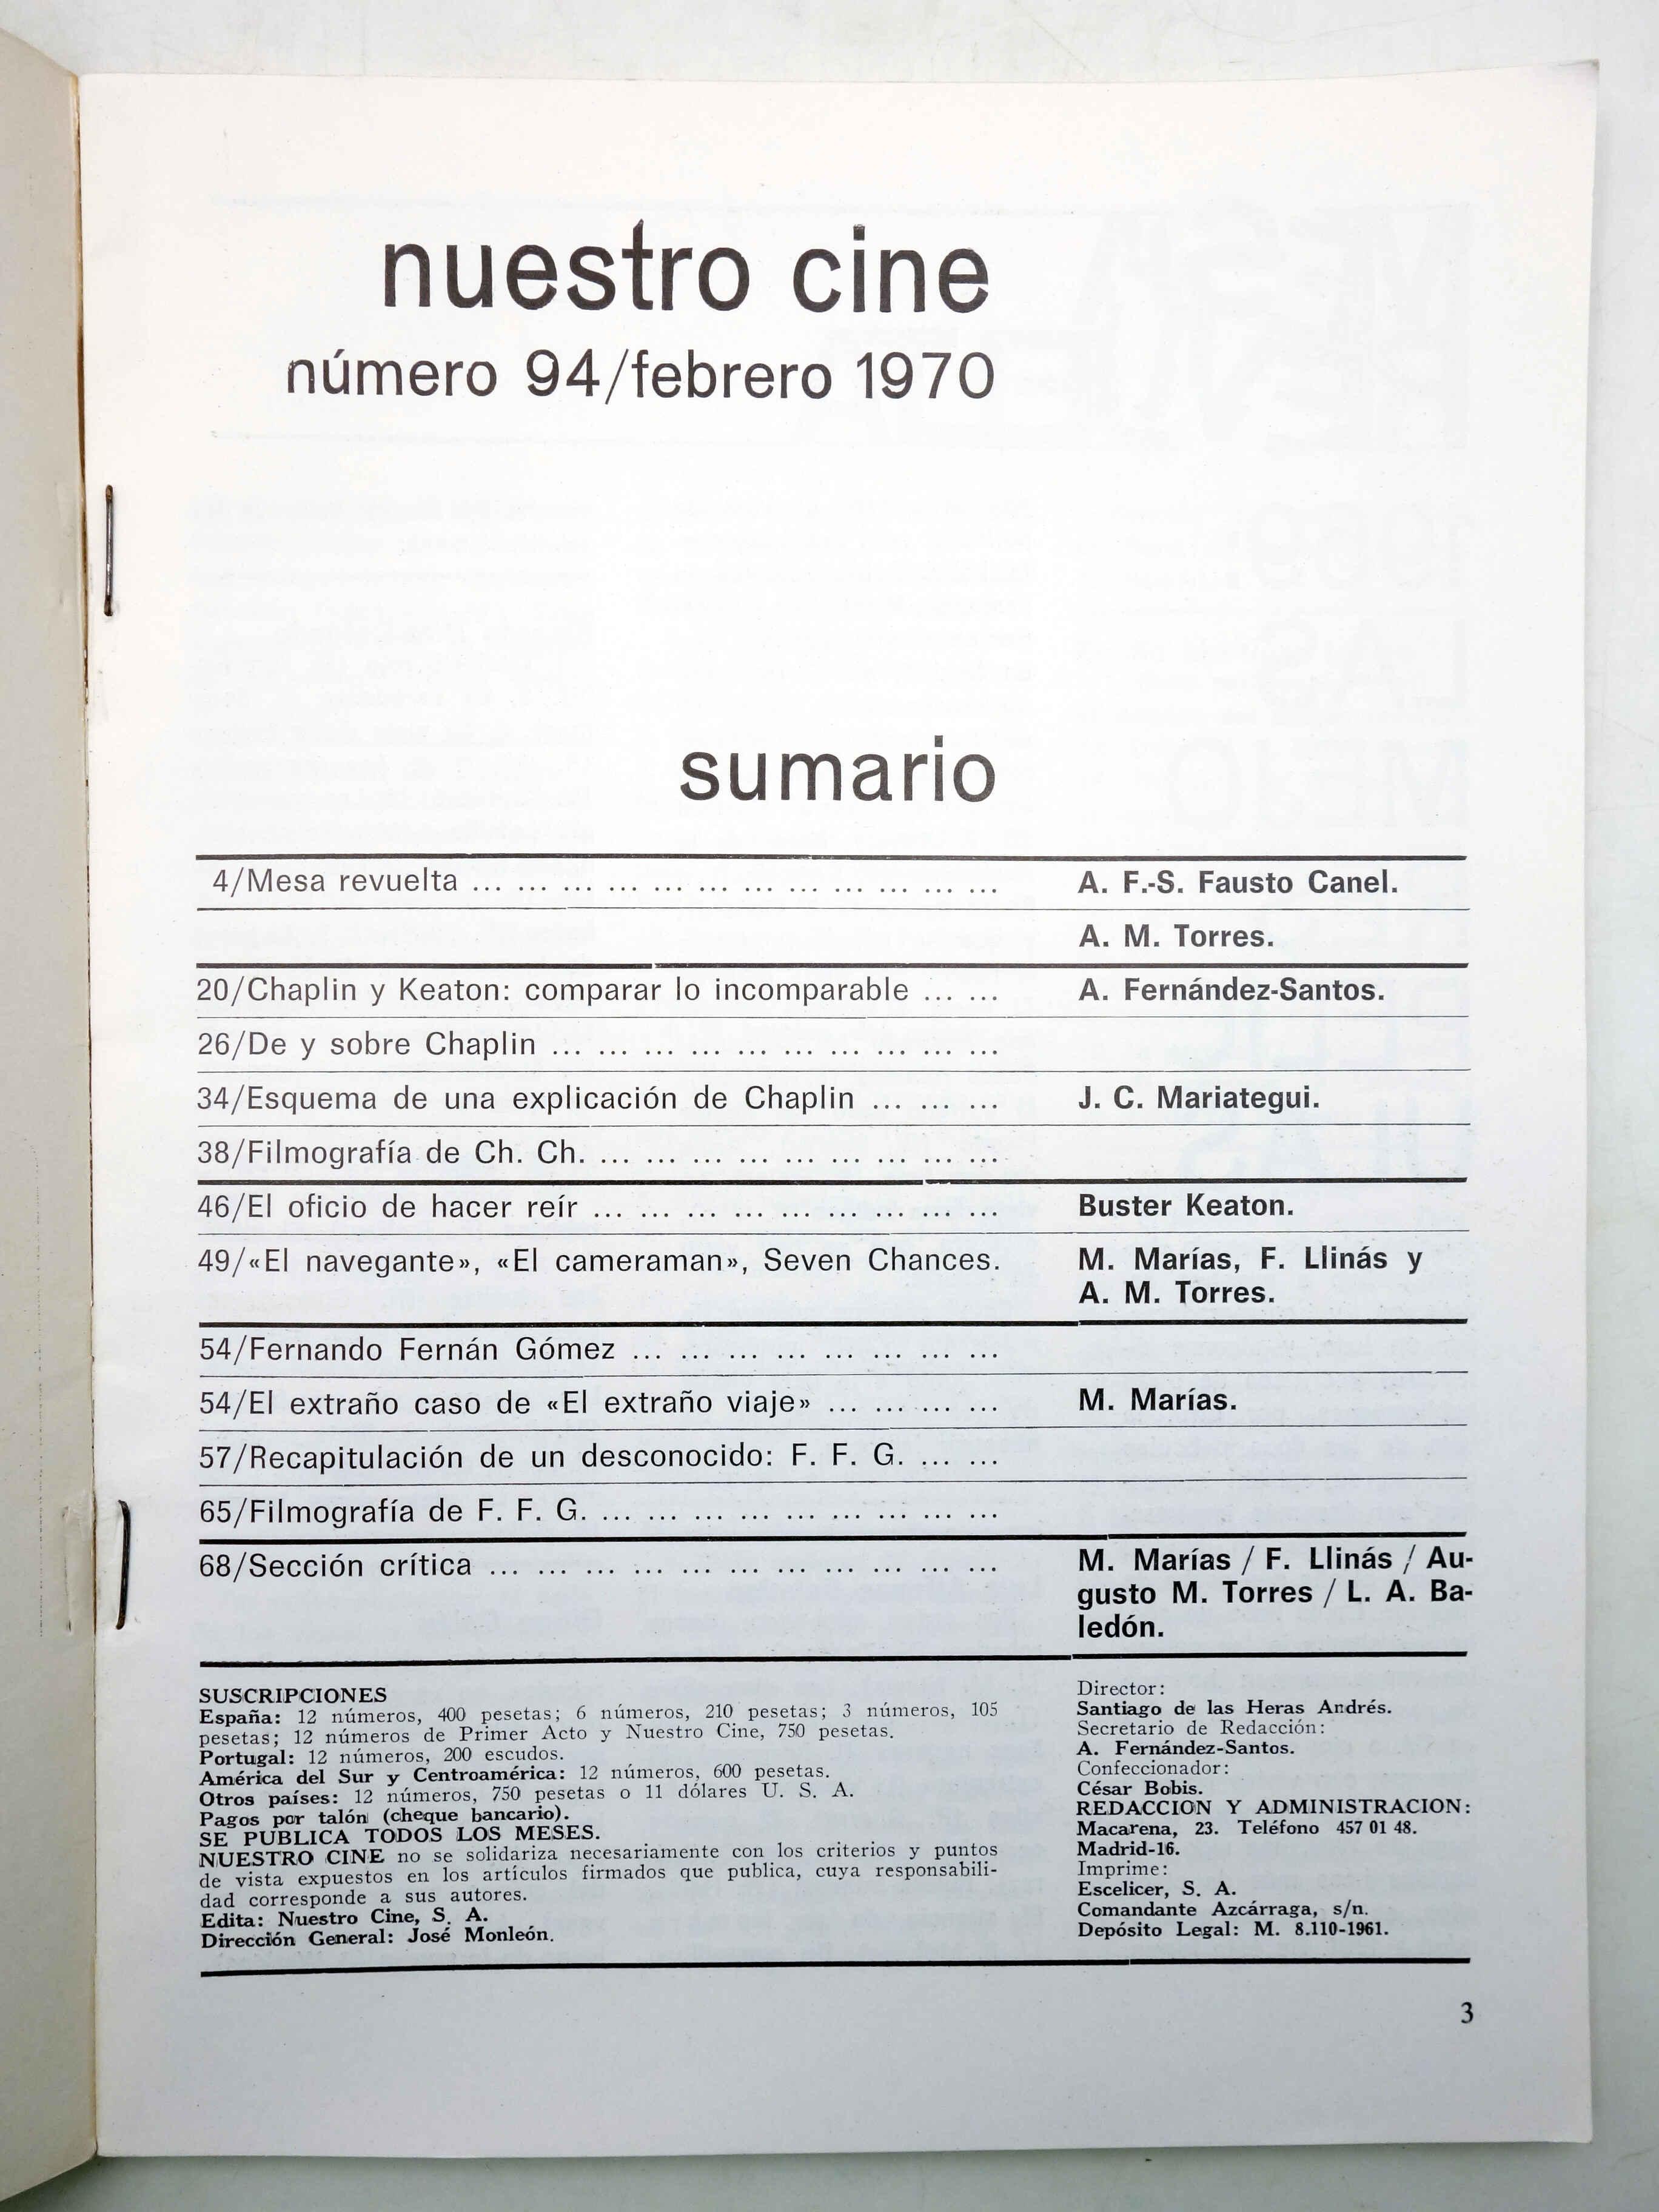 NUESTRO CINE. REVISTA CINEMATOGRÁFICA 94. KEATON, CHAPLIN, FERNÁN GÓMEZ